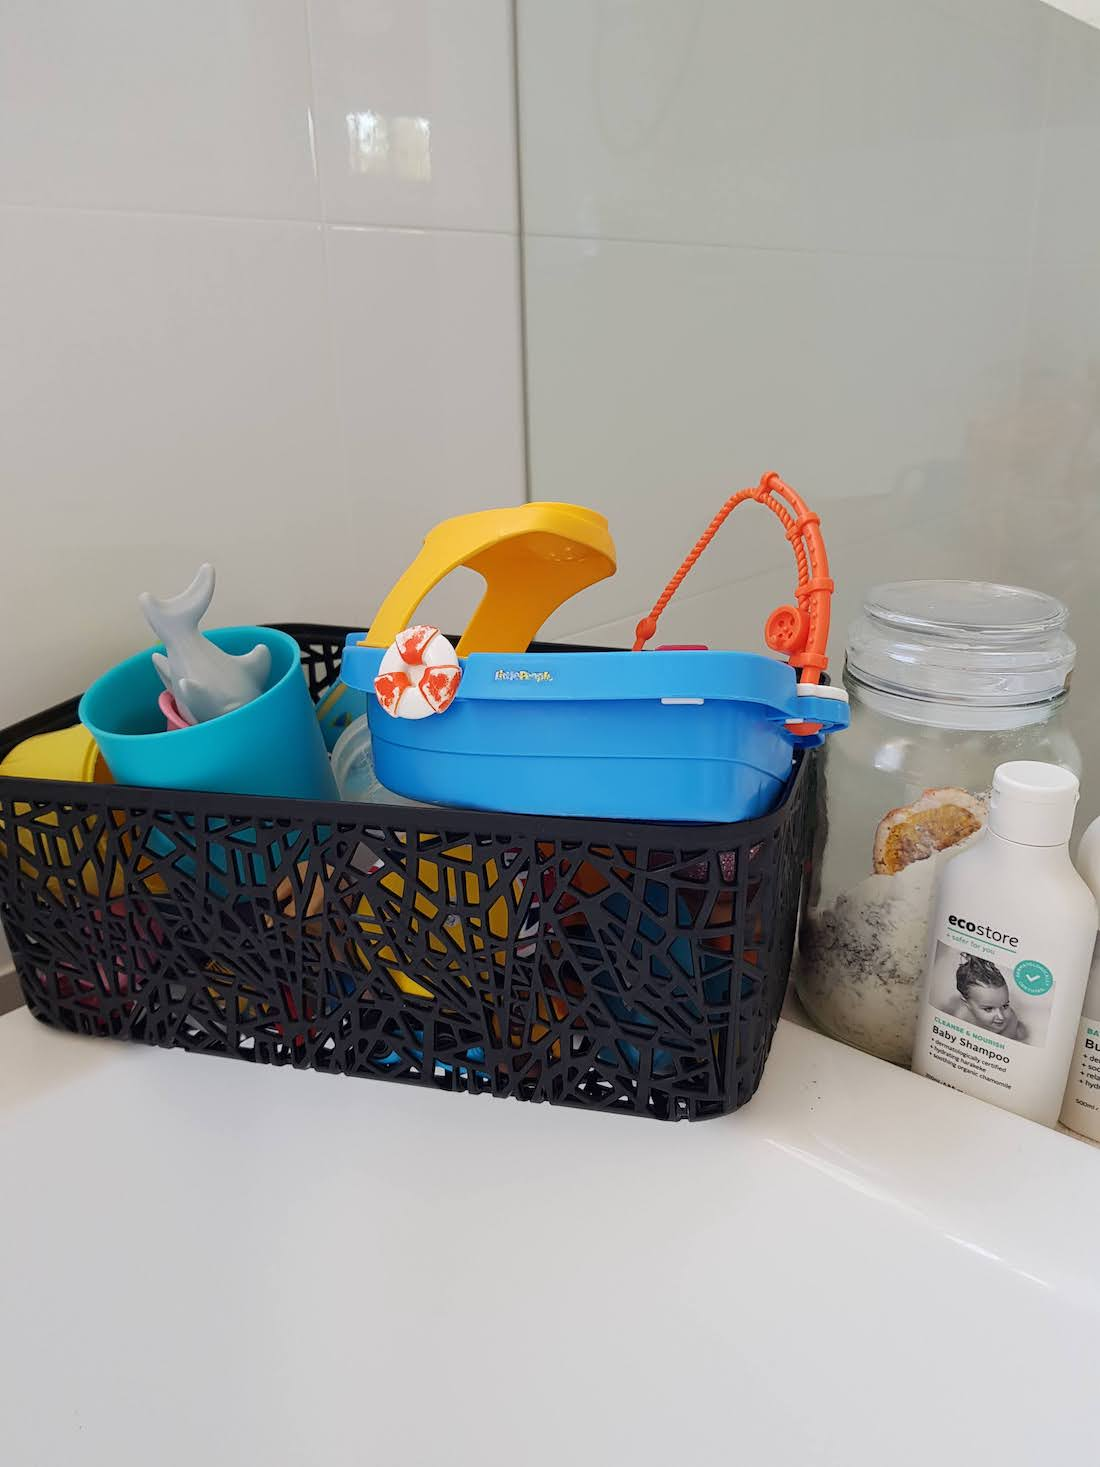 Bath toys stored in Kmart basket